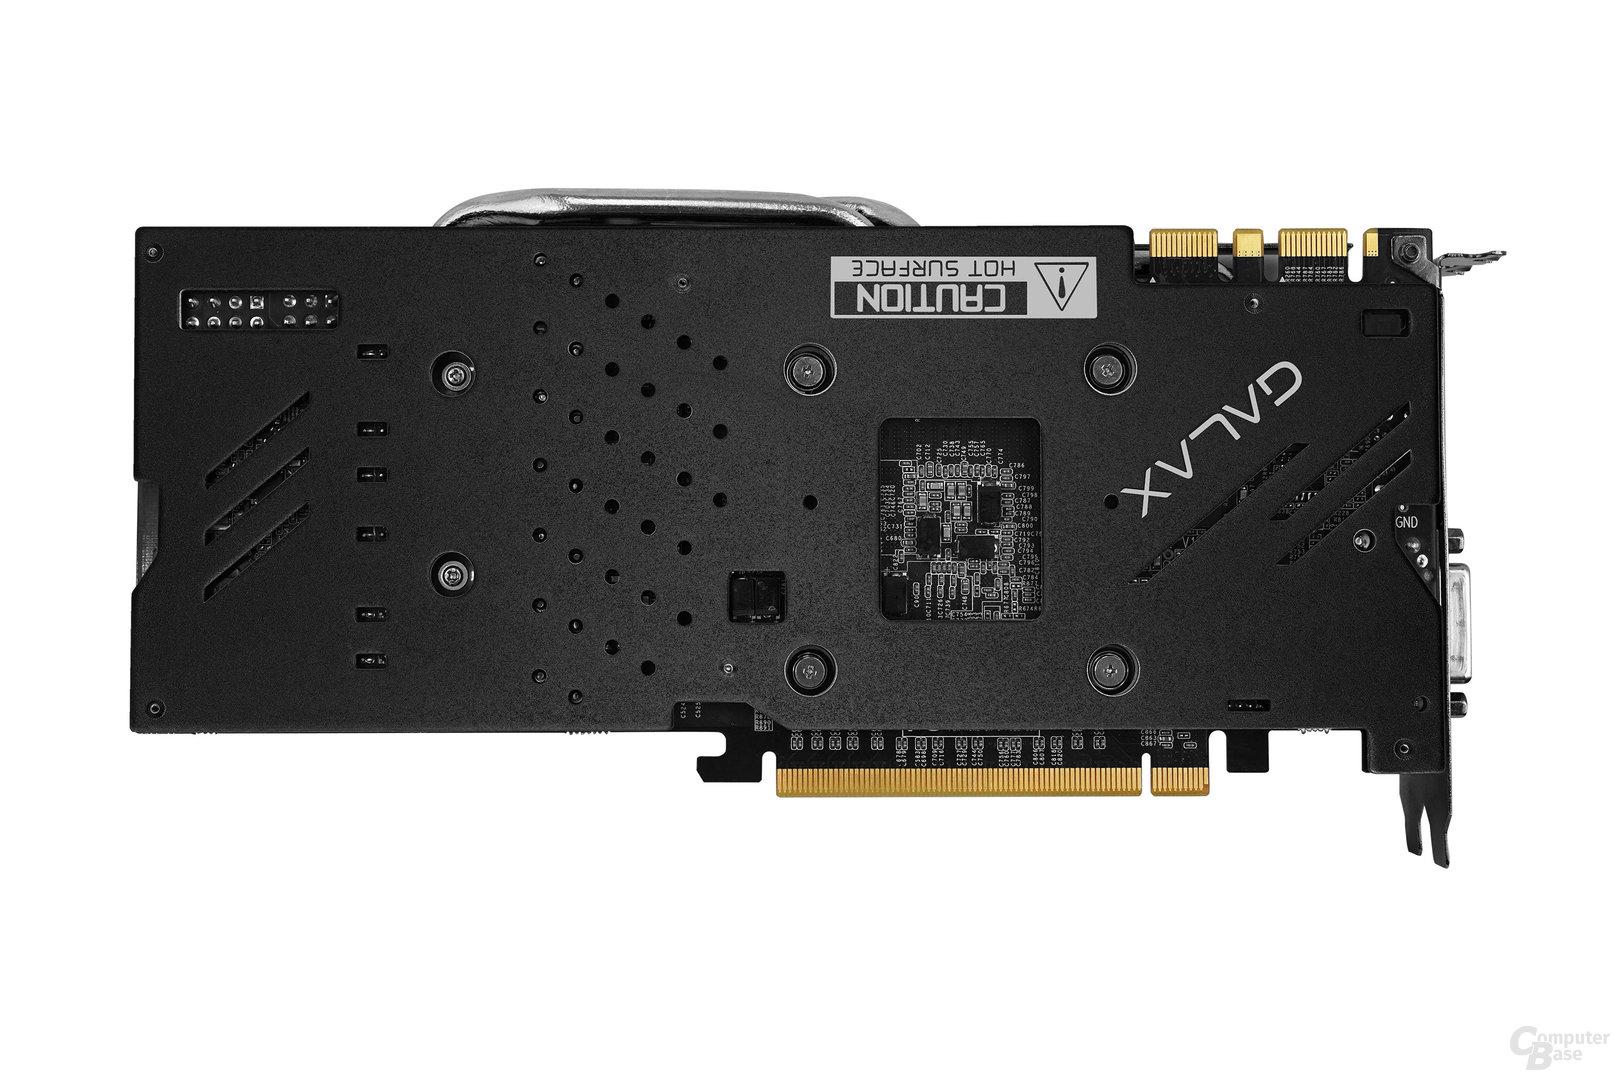 Galax GTX 970 EXOC Black Edition